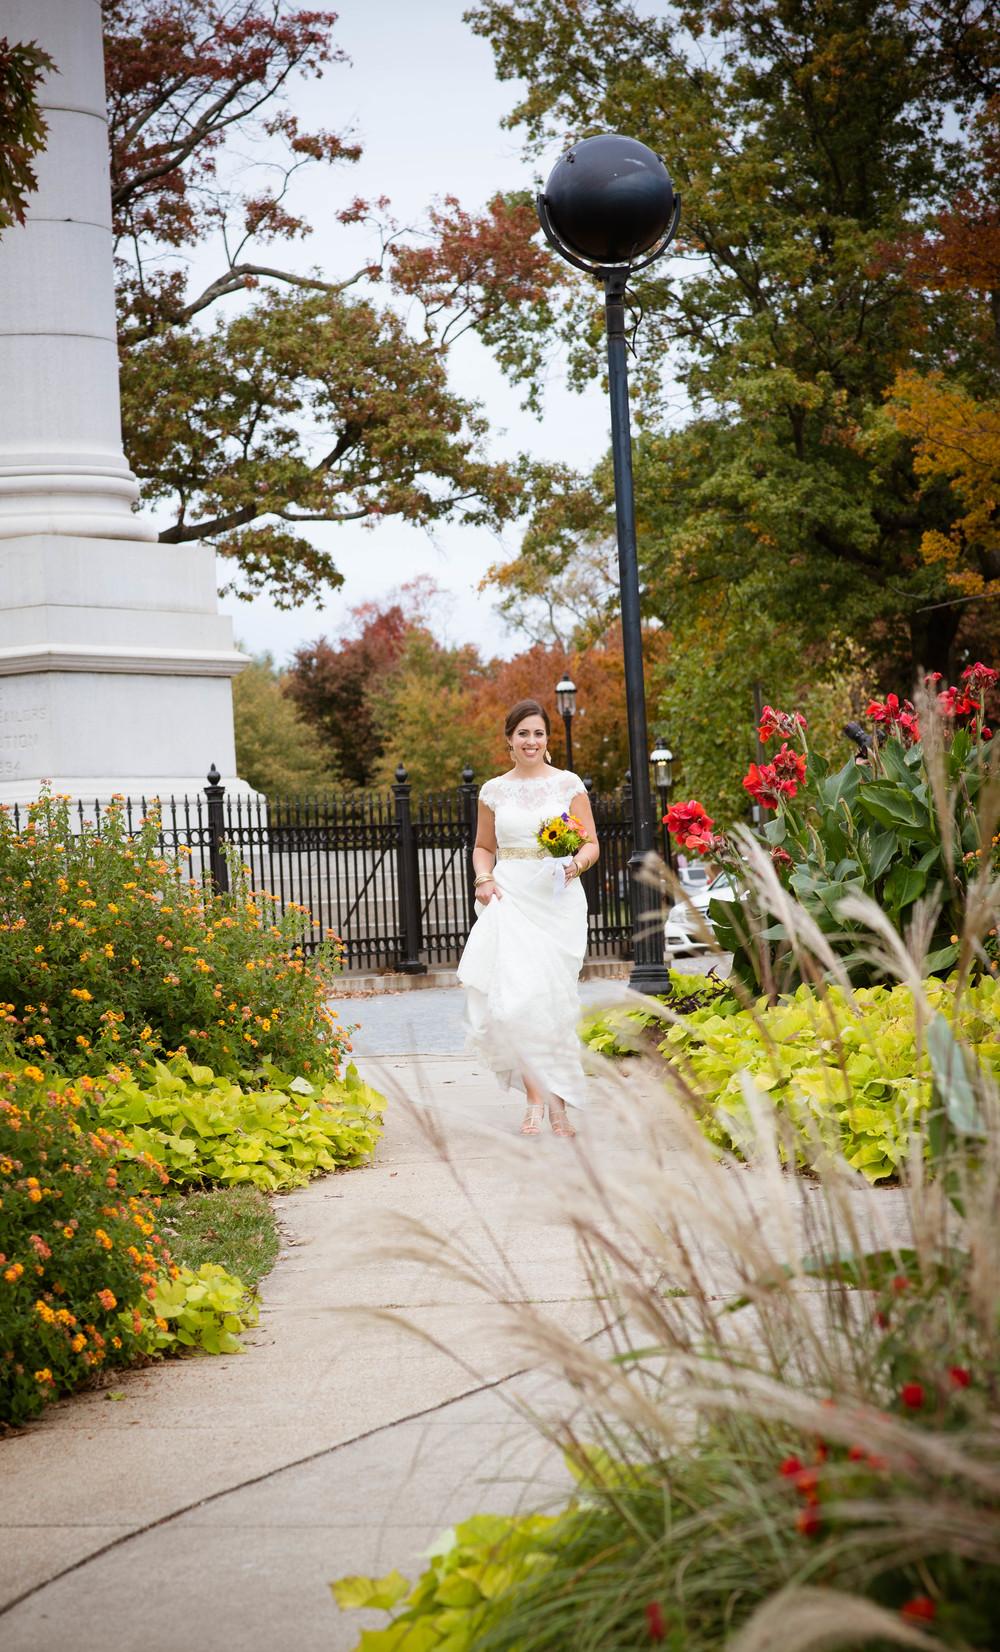 Anania_Wedding-16.jpg